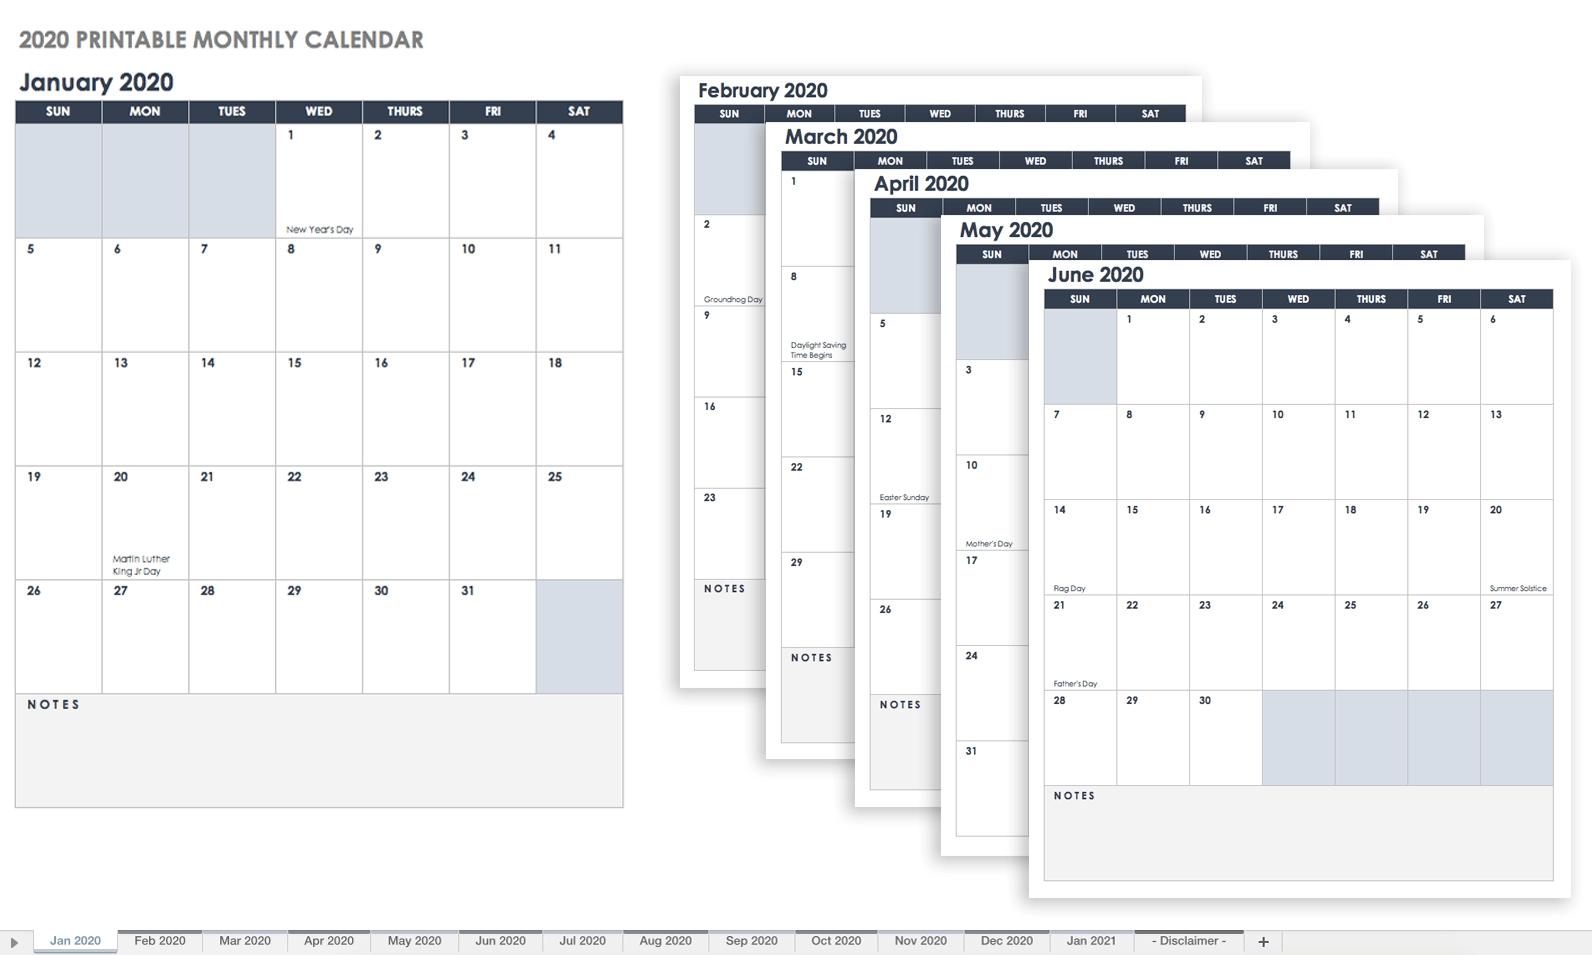 Free Blank Calendar Templates - Smartsheet within Printable Blank Weekly Calendars Templates